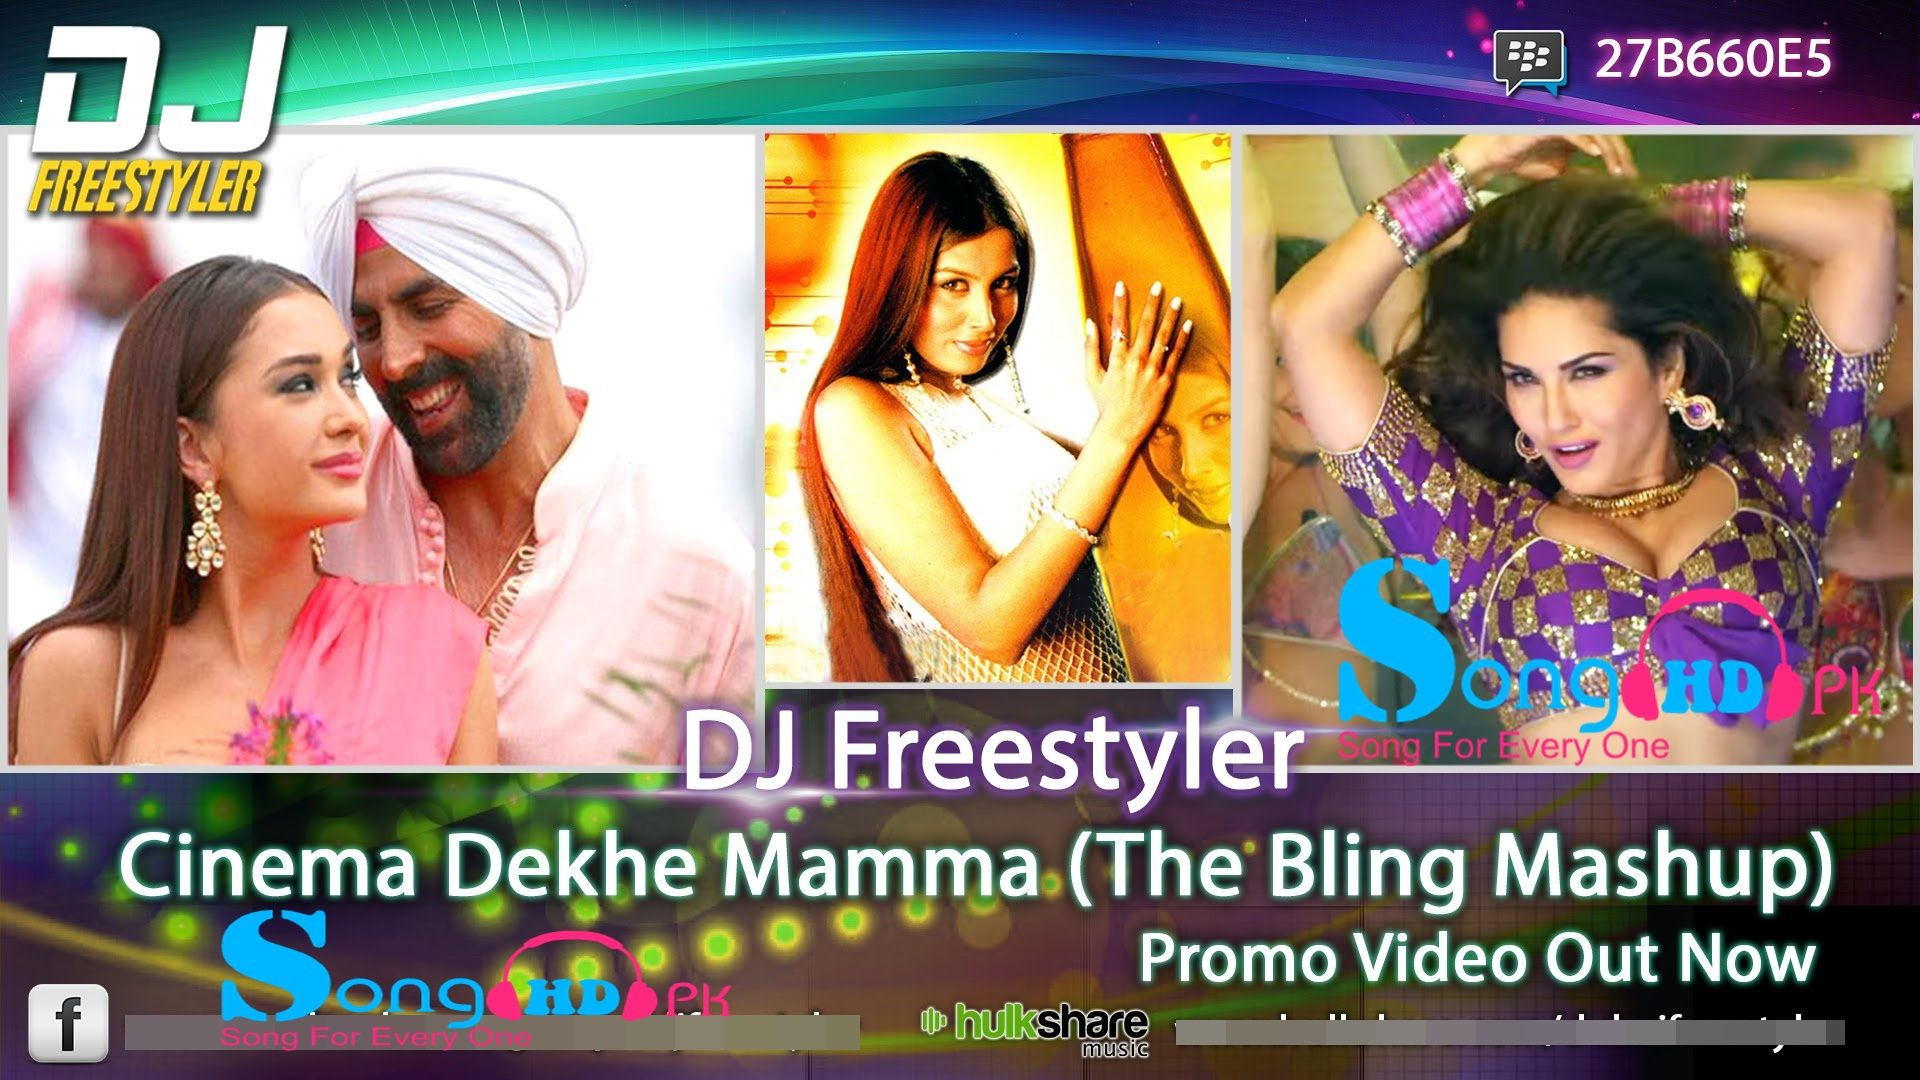 cinema dekhe mamma mp3 song free download